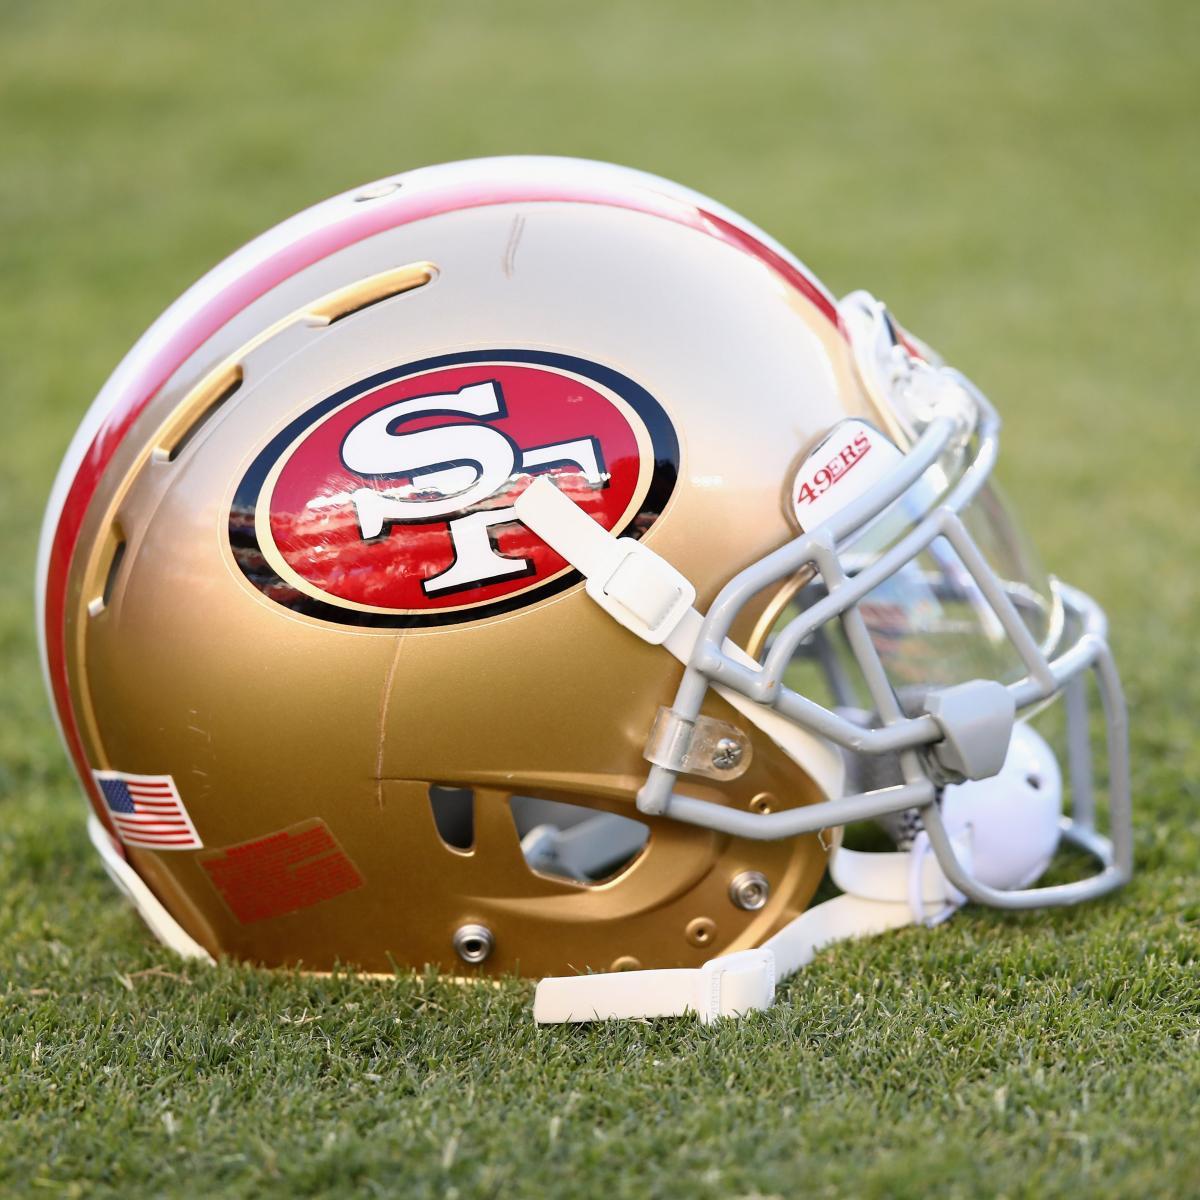 48c7d4ba28f 49ers Unveil New Throwback Alternate Uniforms for 2018 Season ...